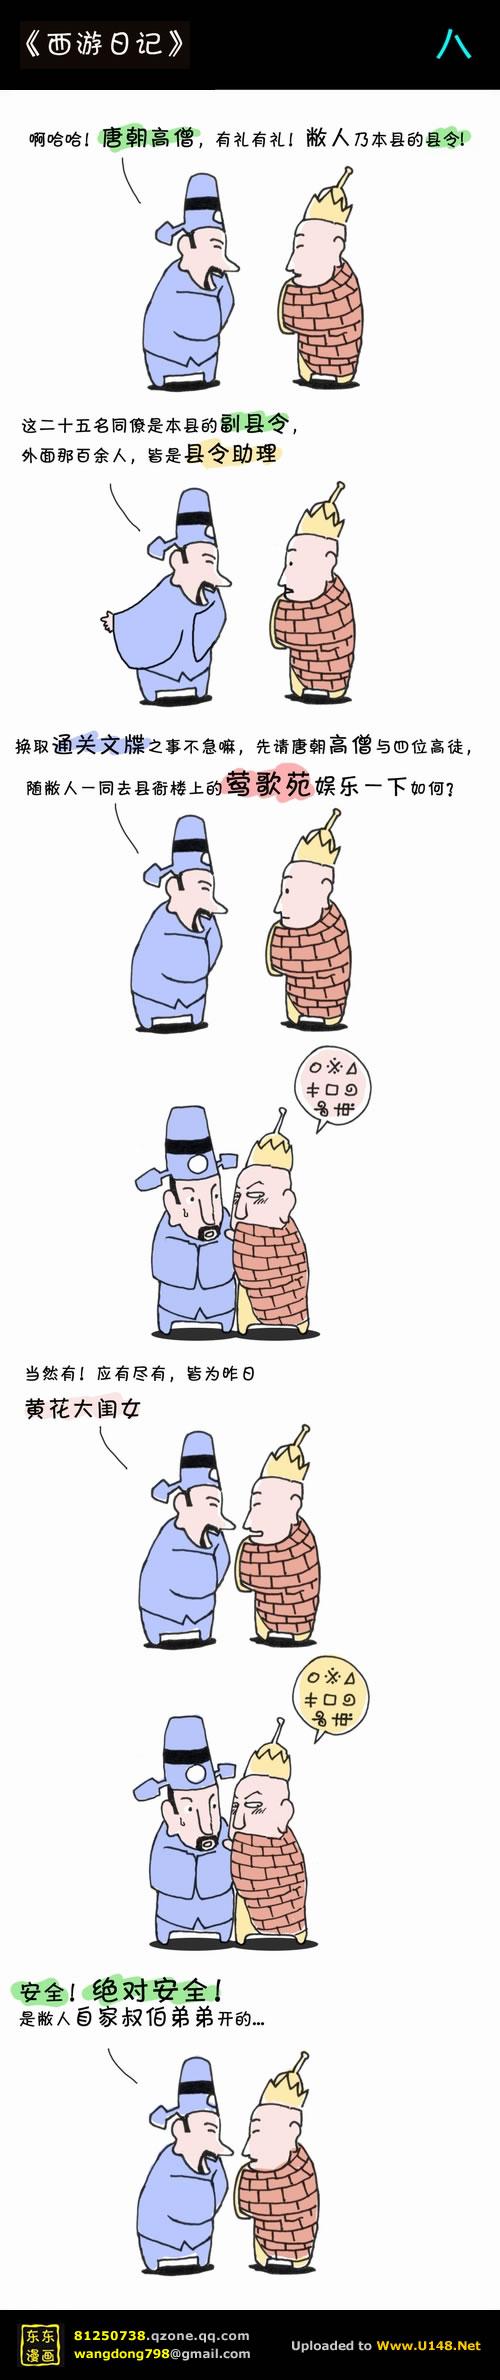 xiyouriji092